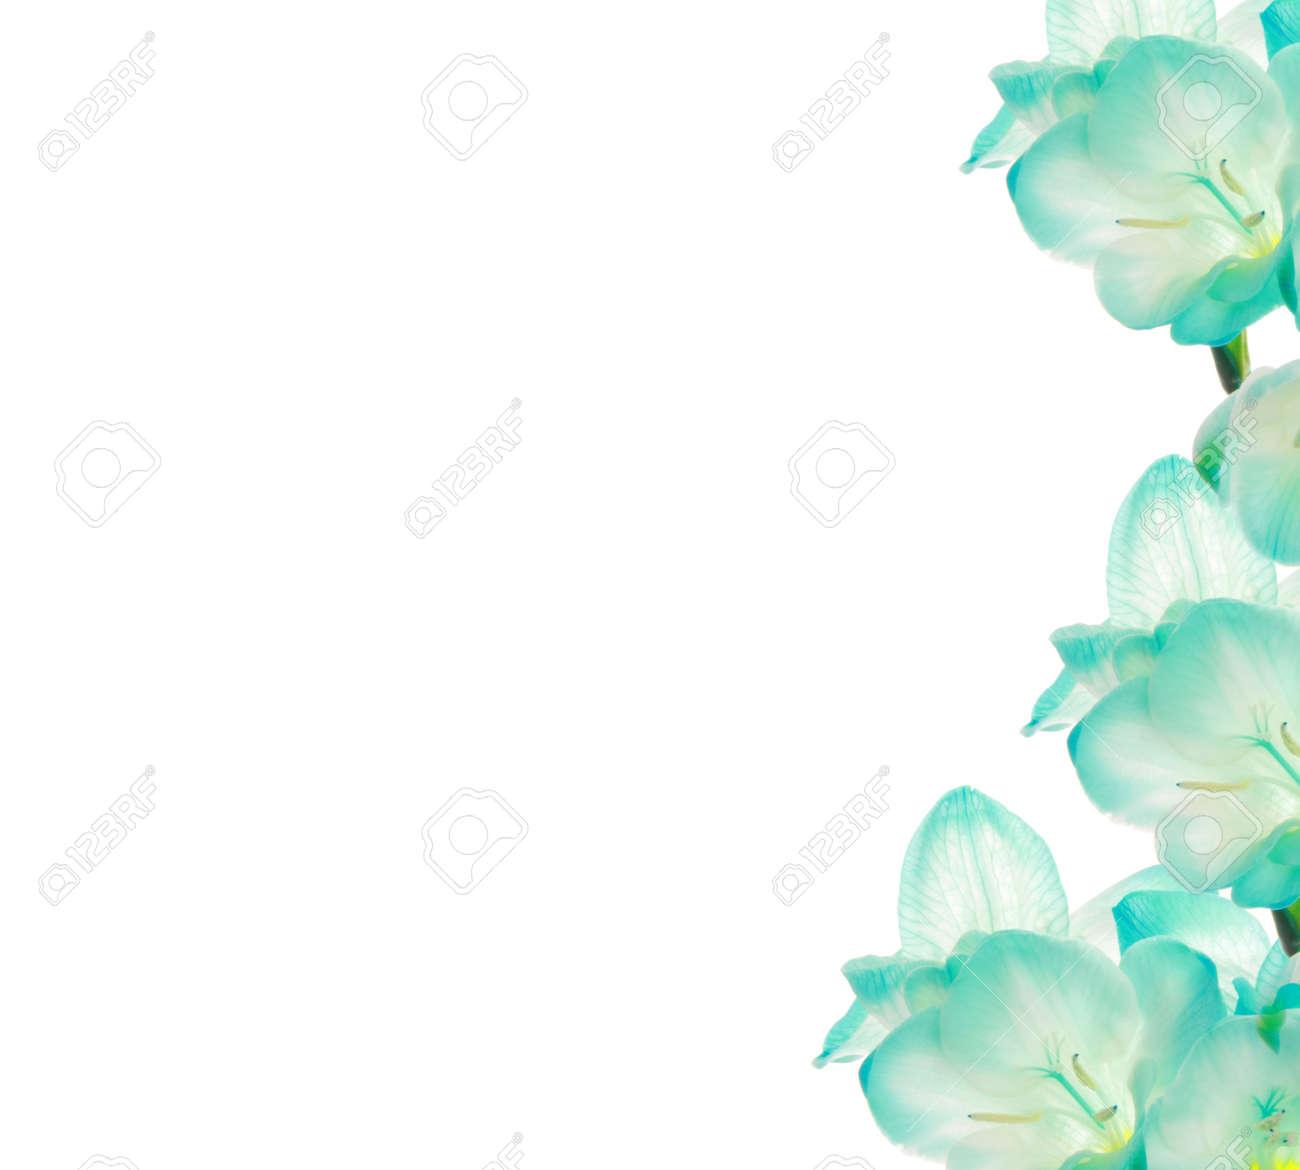 Fresia Flower Border Design Isolated On White Stock Photo